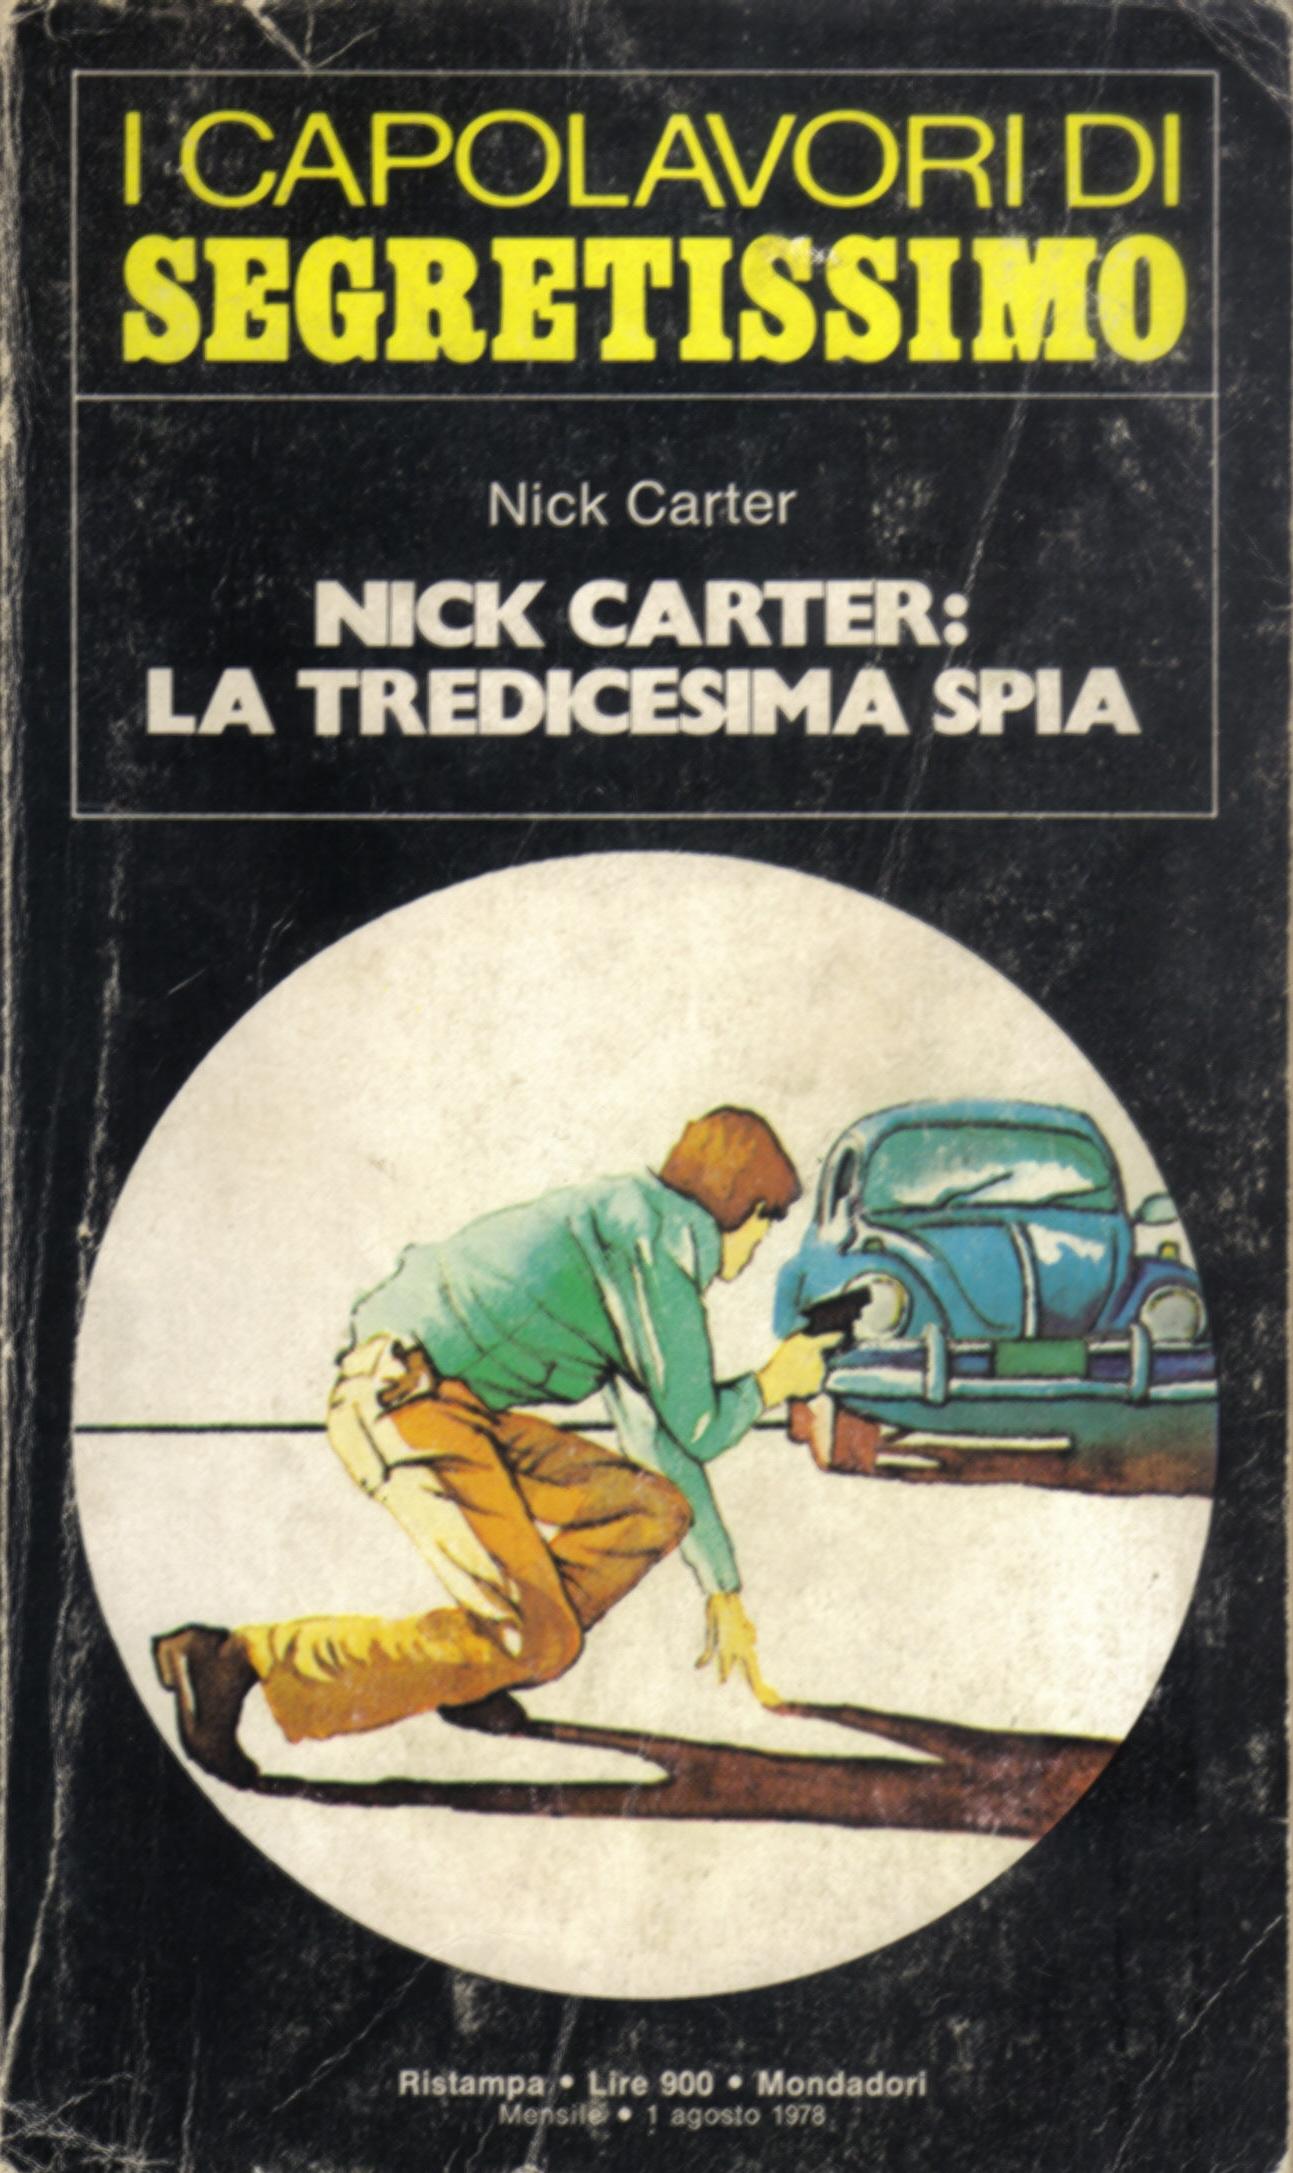 Nick Carter: La tredicesima spia